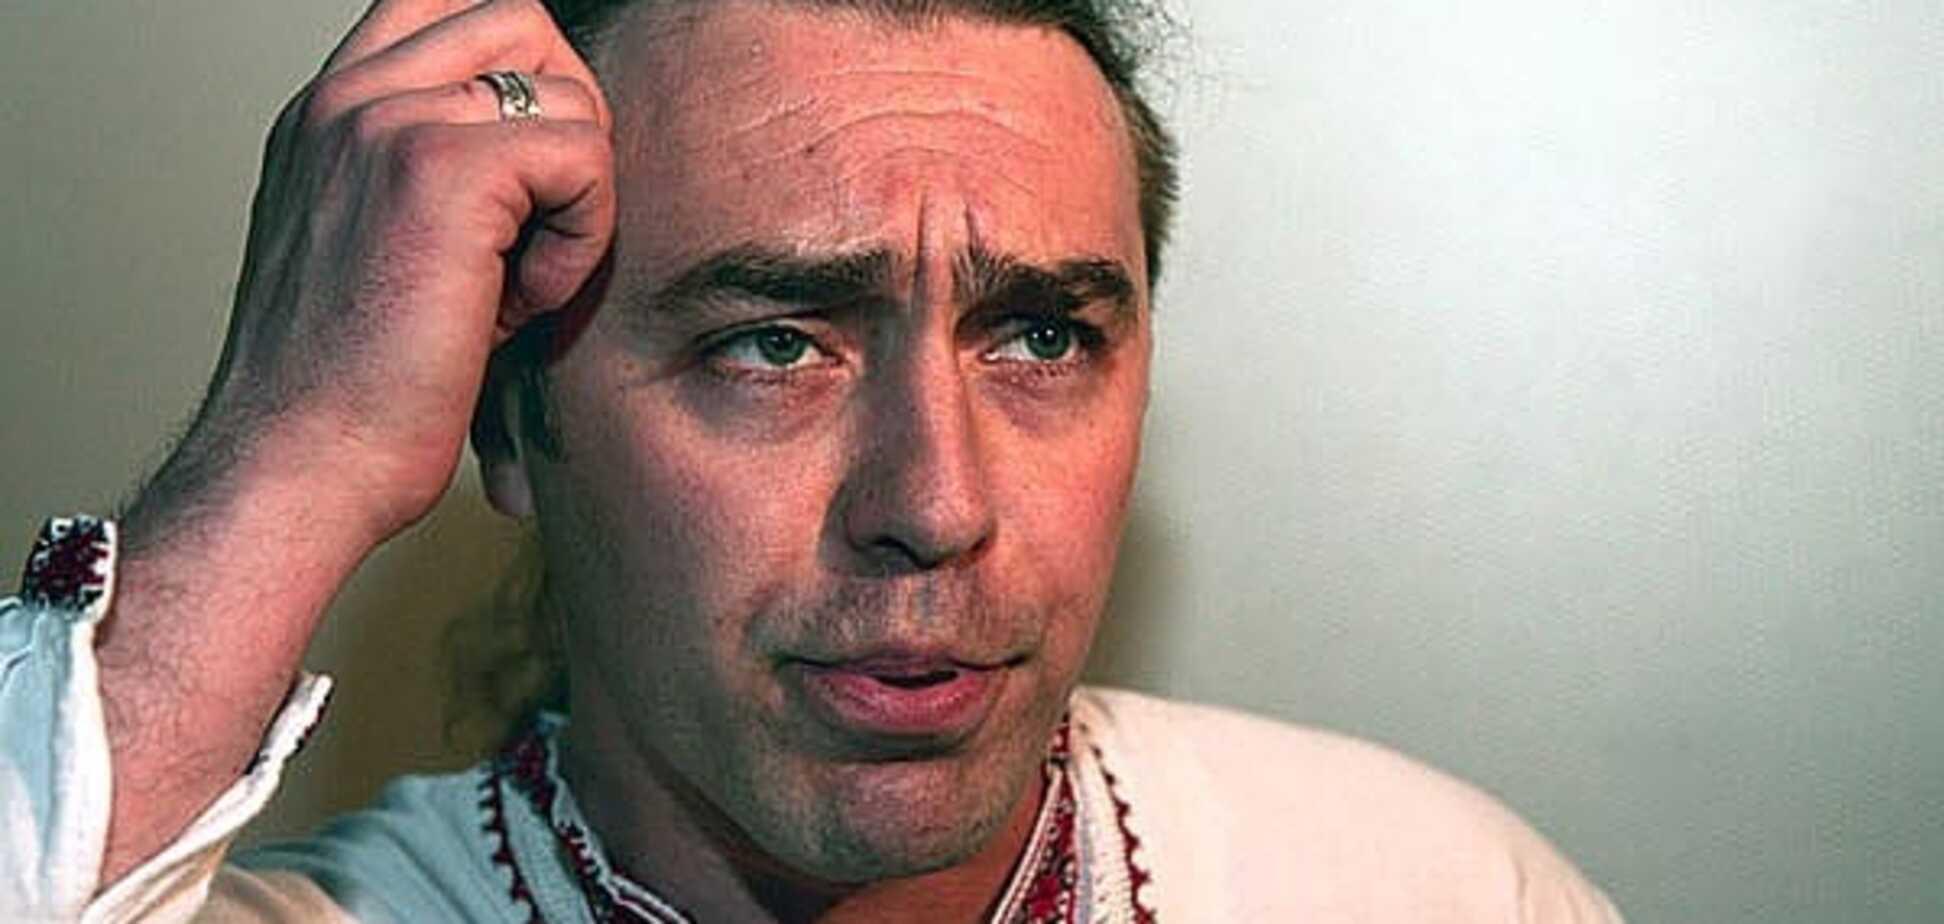 Бочка дьогтю депутата Ігоря Мірошниченка